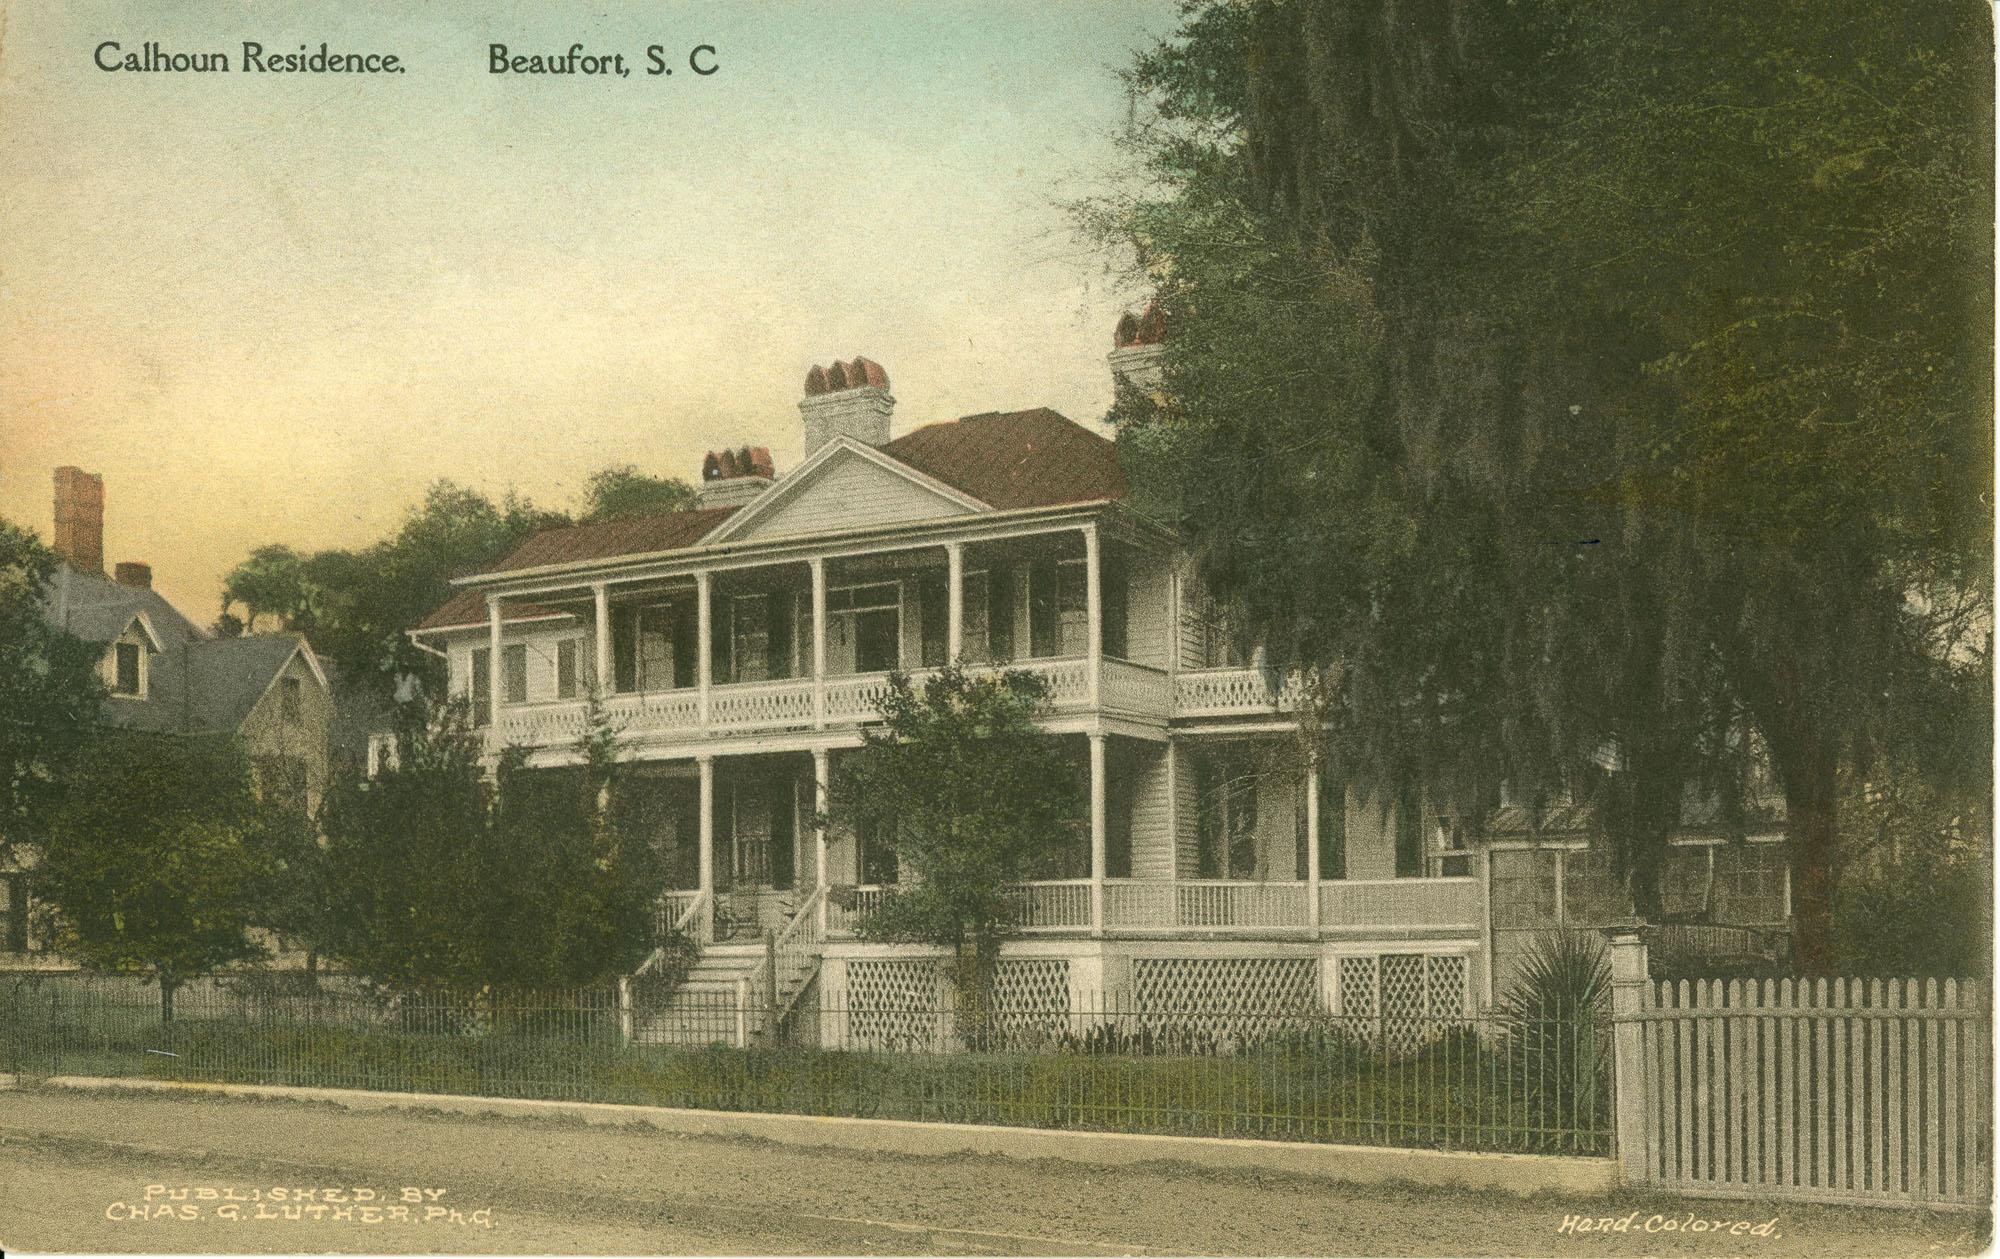 Calhoun Residence Beaufort, S.C.